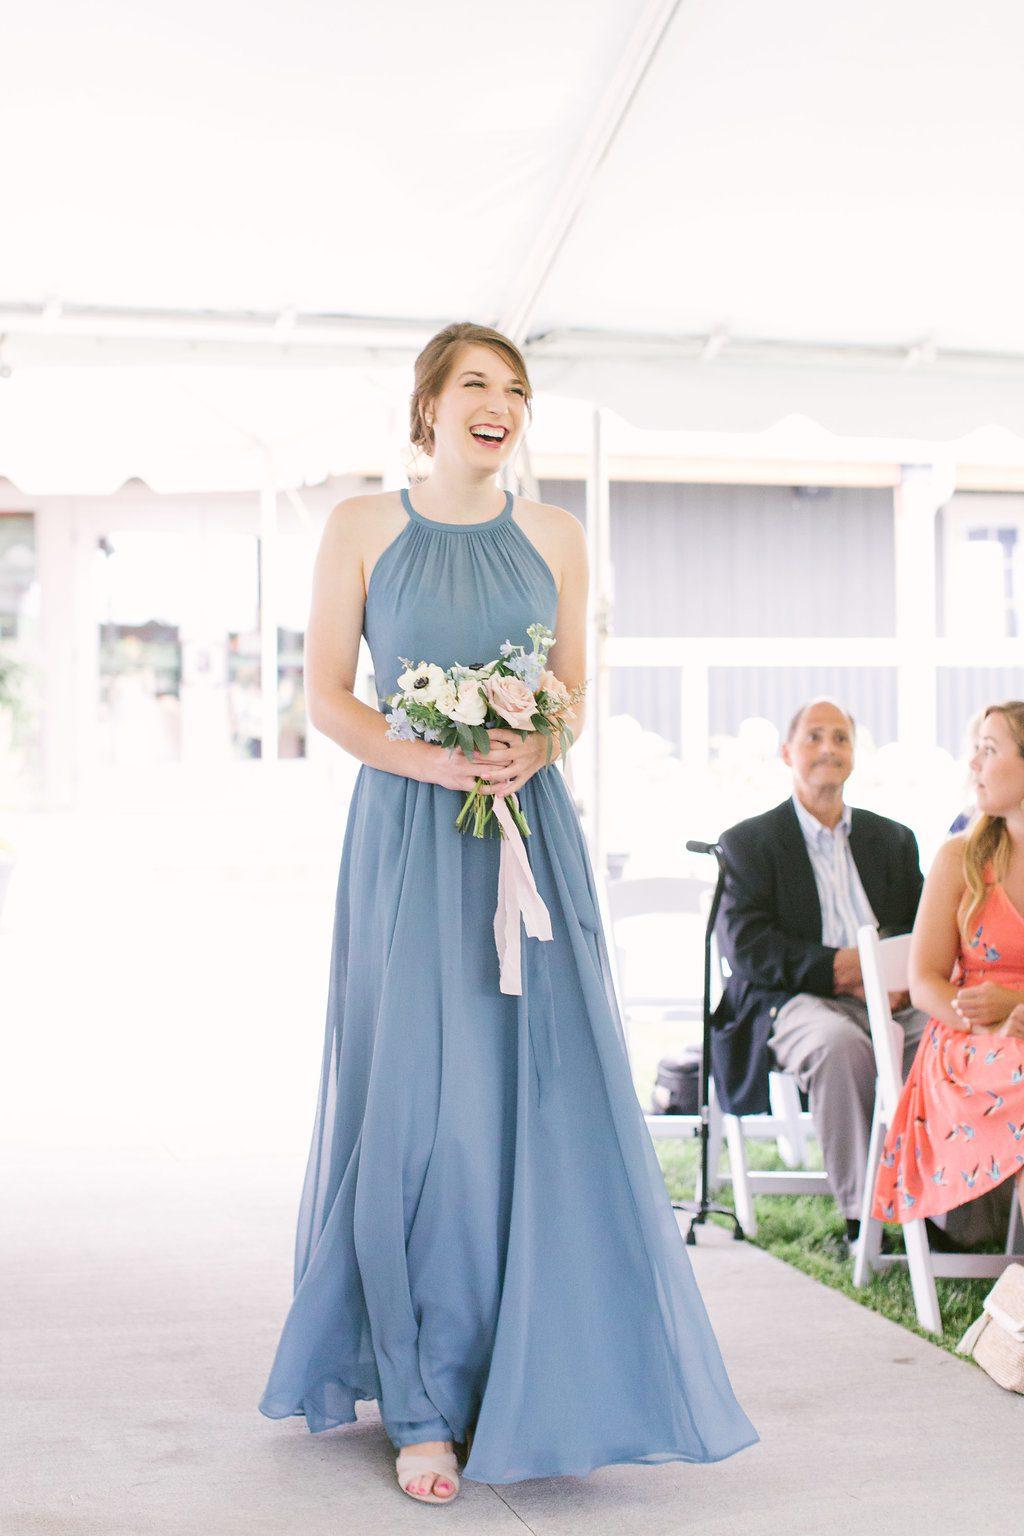 Kennedy Blue featured on Novelty Bride - Rayce PR